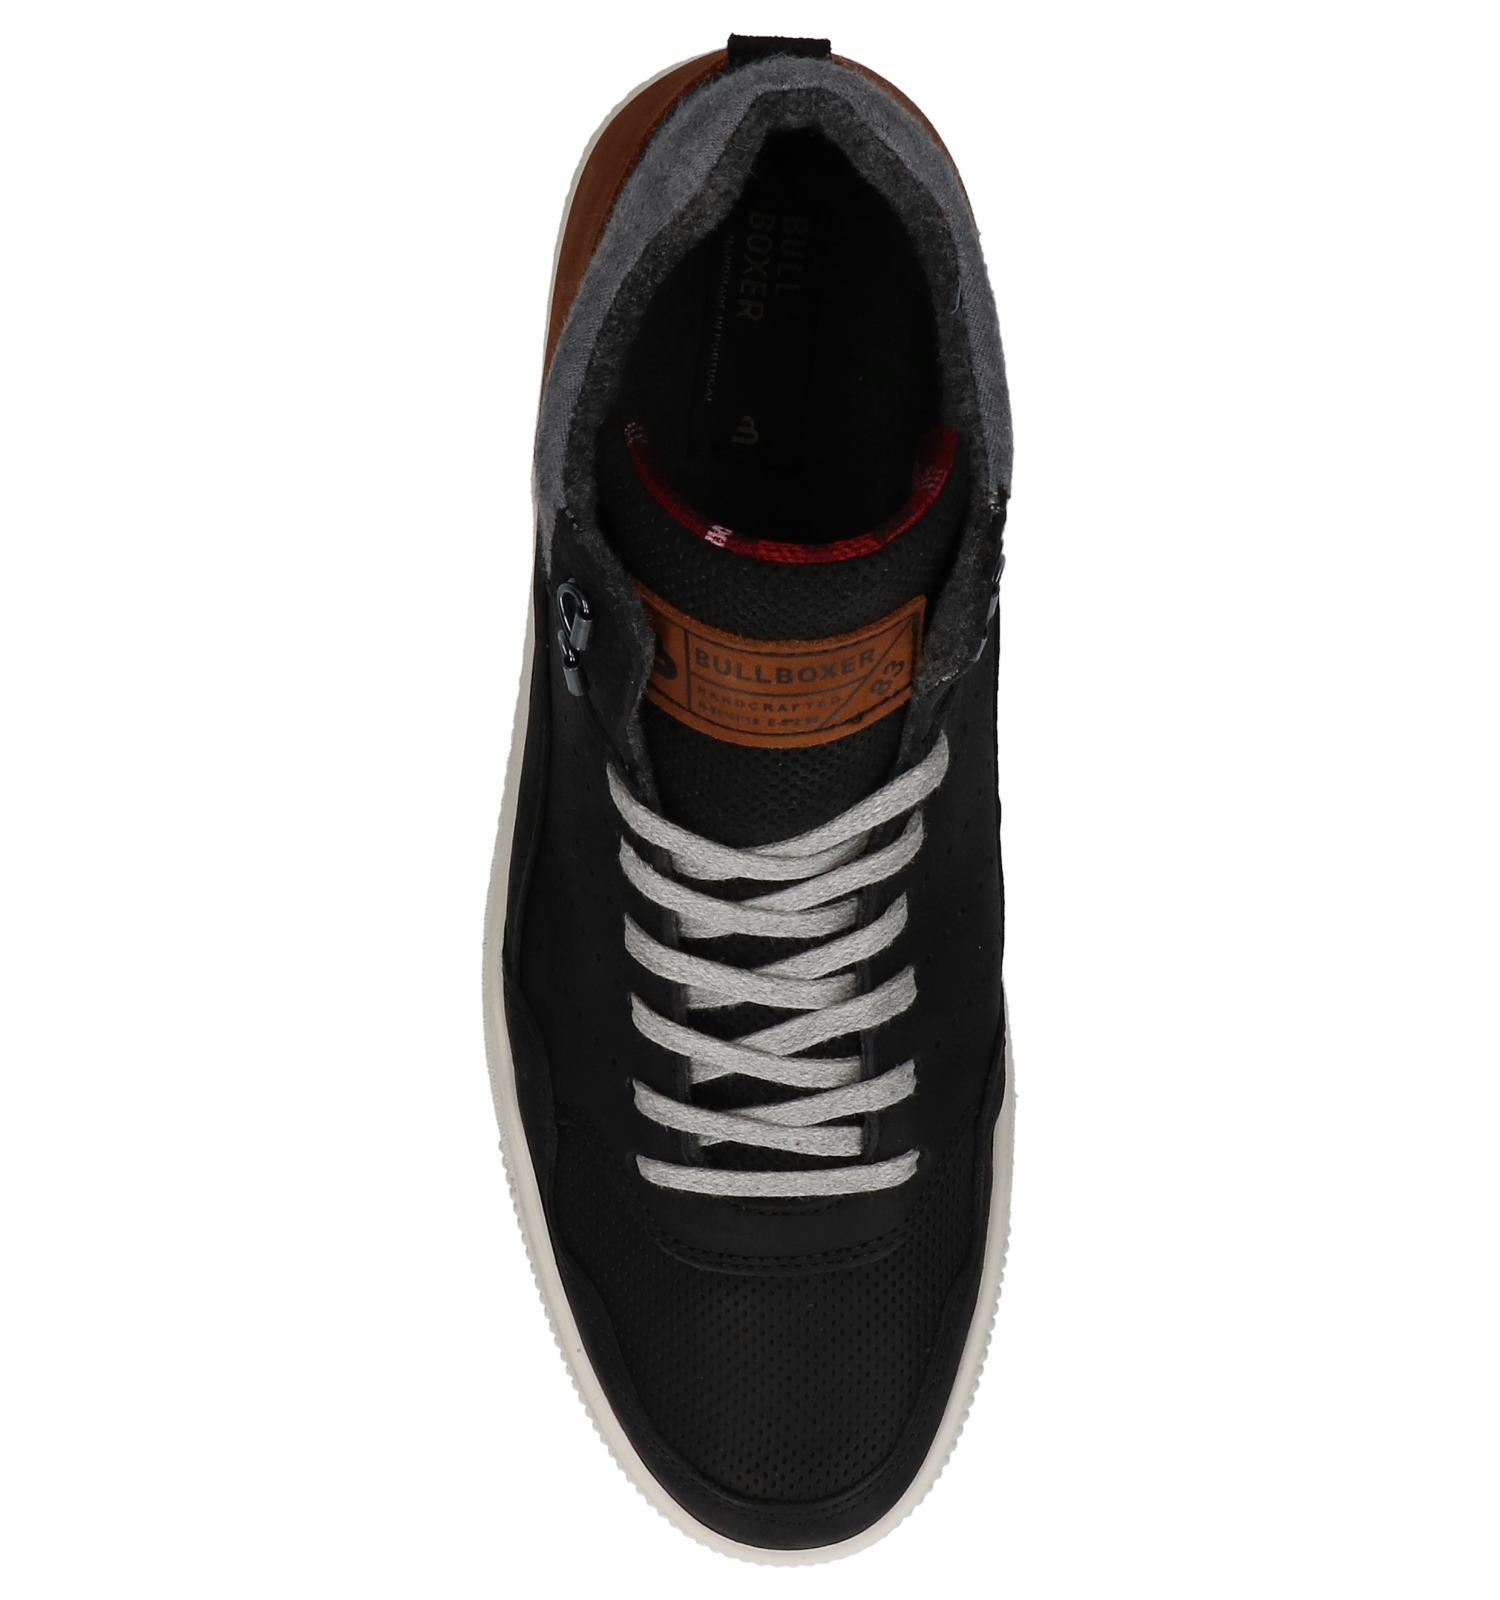 cded27f298f Zwarte Bullboxer Hoge Sneakers | TORFS.BE | Gratis verzend en retour